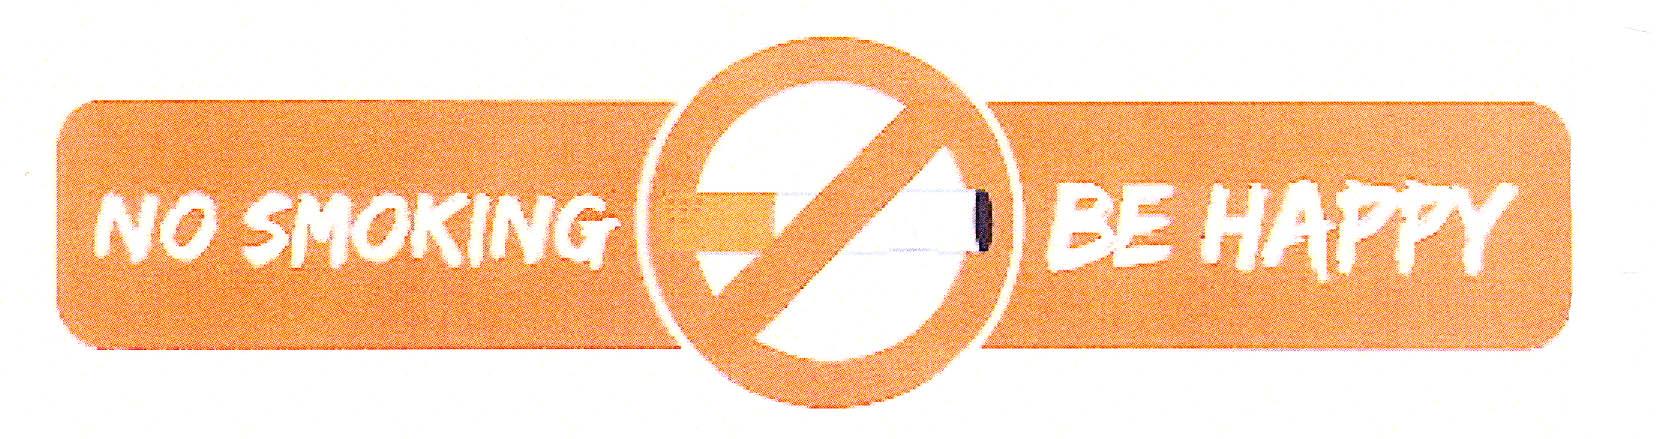 NO SMOKING BE HAPPY